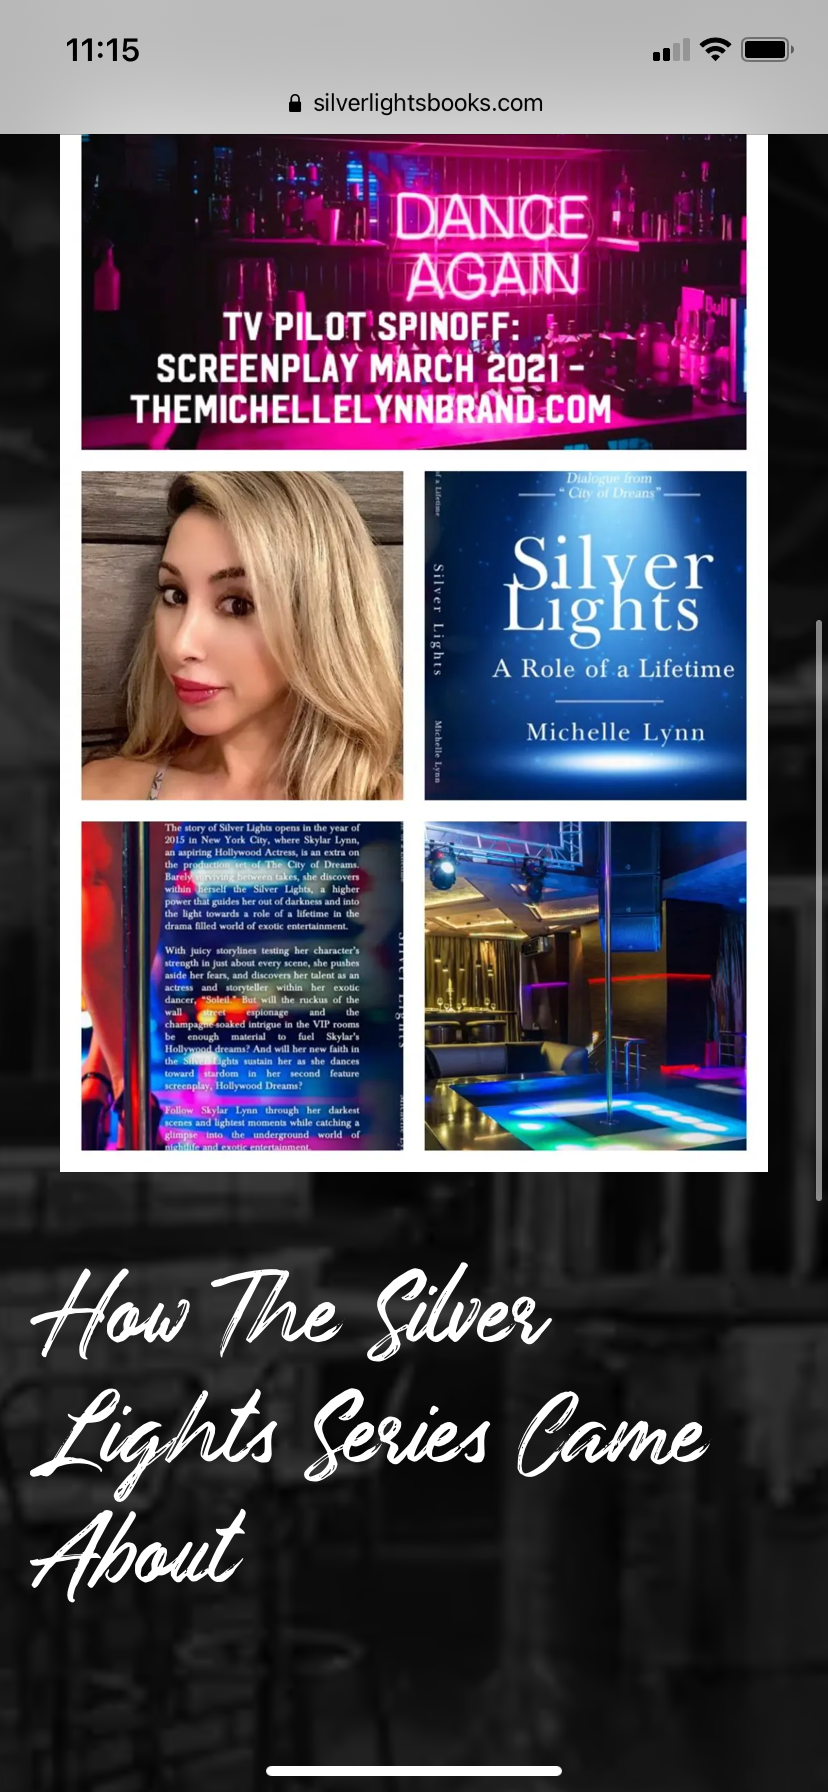 Silver Lights Books Series